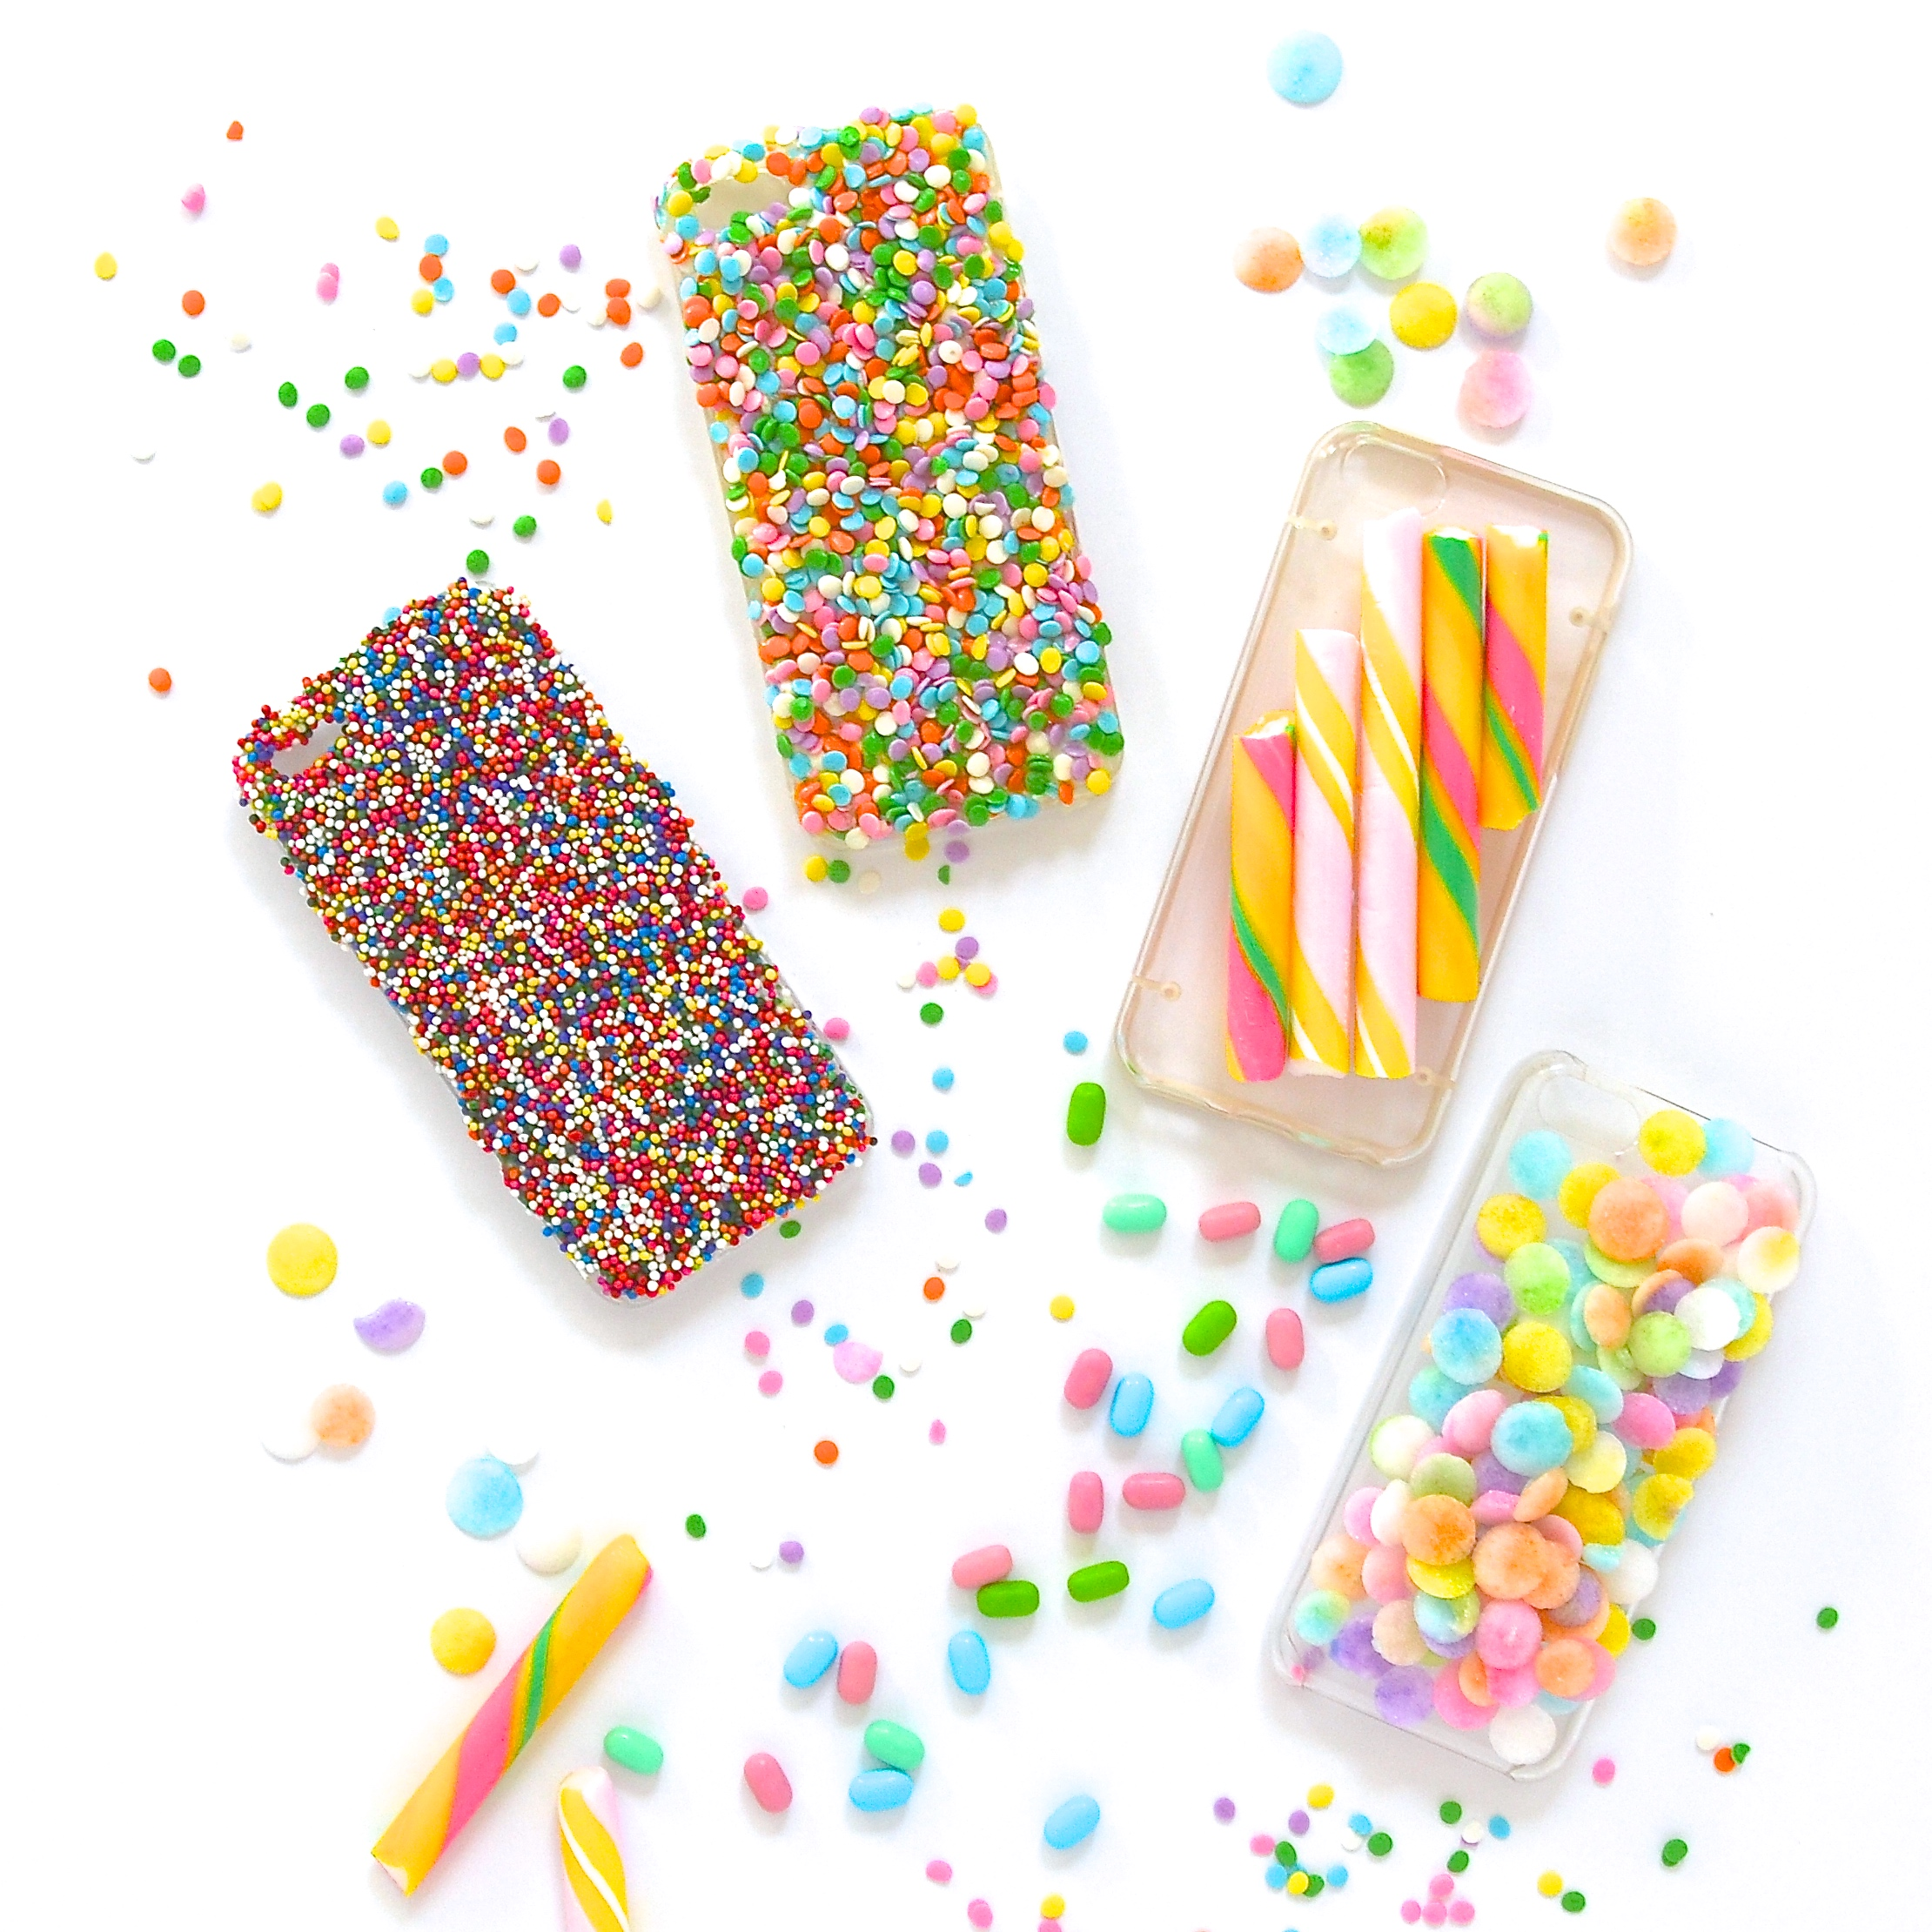 DIY Candy iPhone Candy Case Violet Tinder